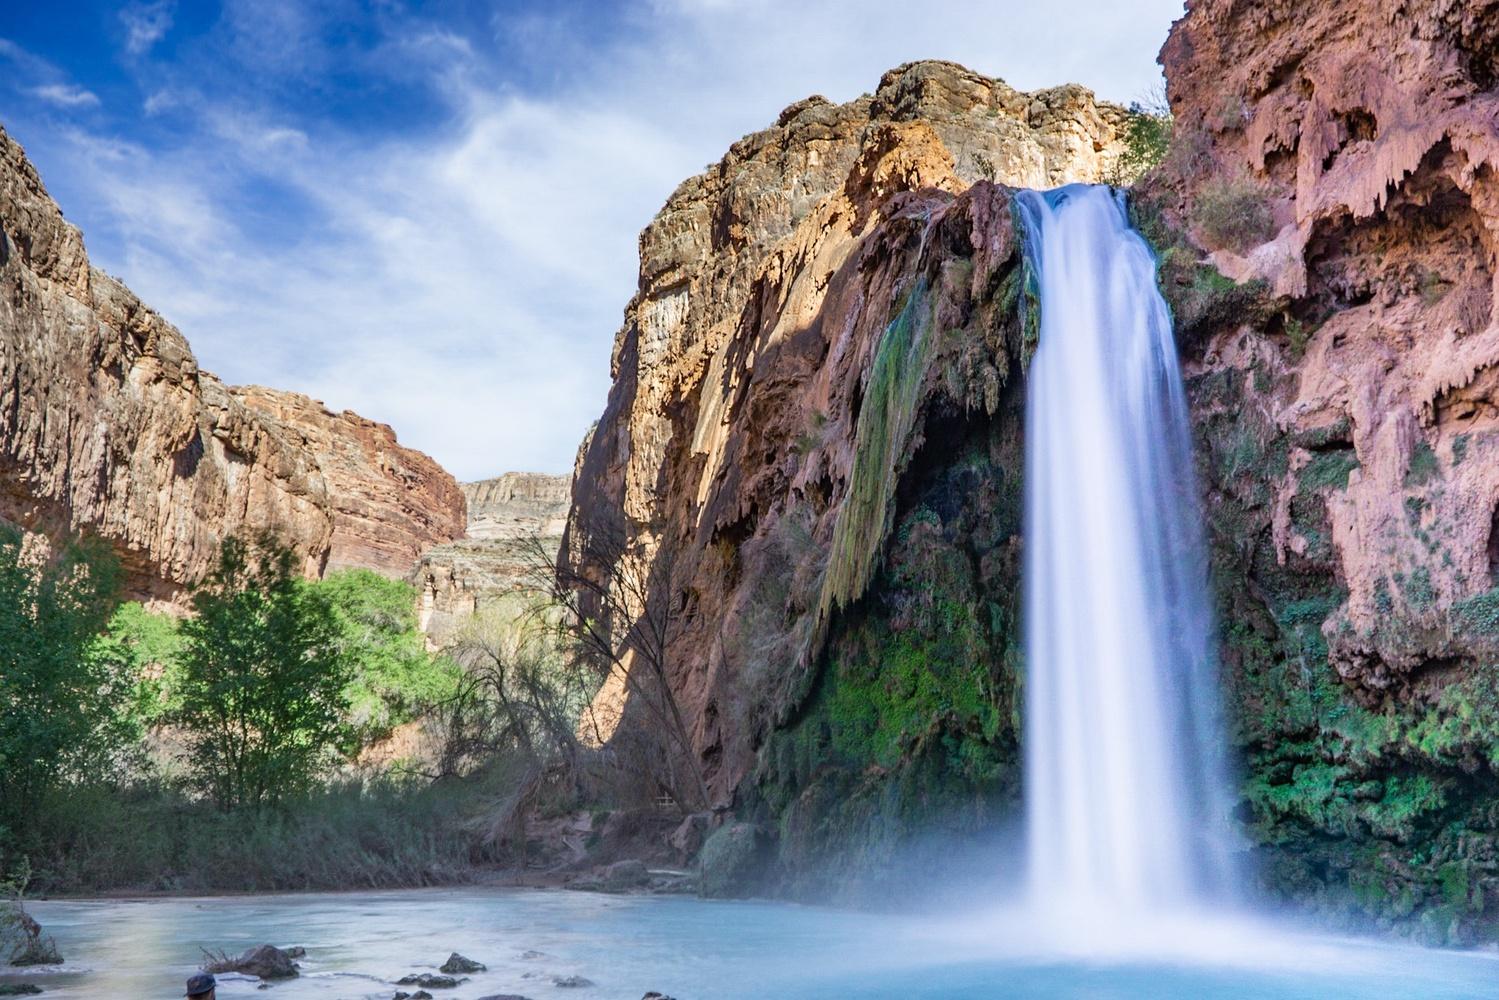 Havasu Falls by John Bessette